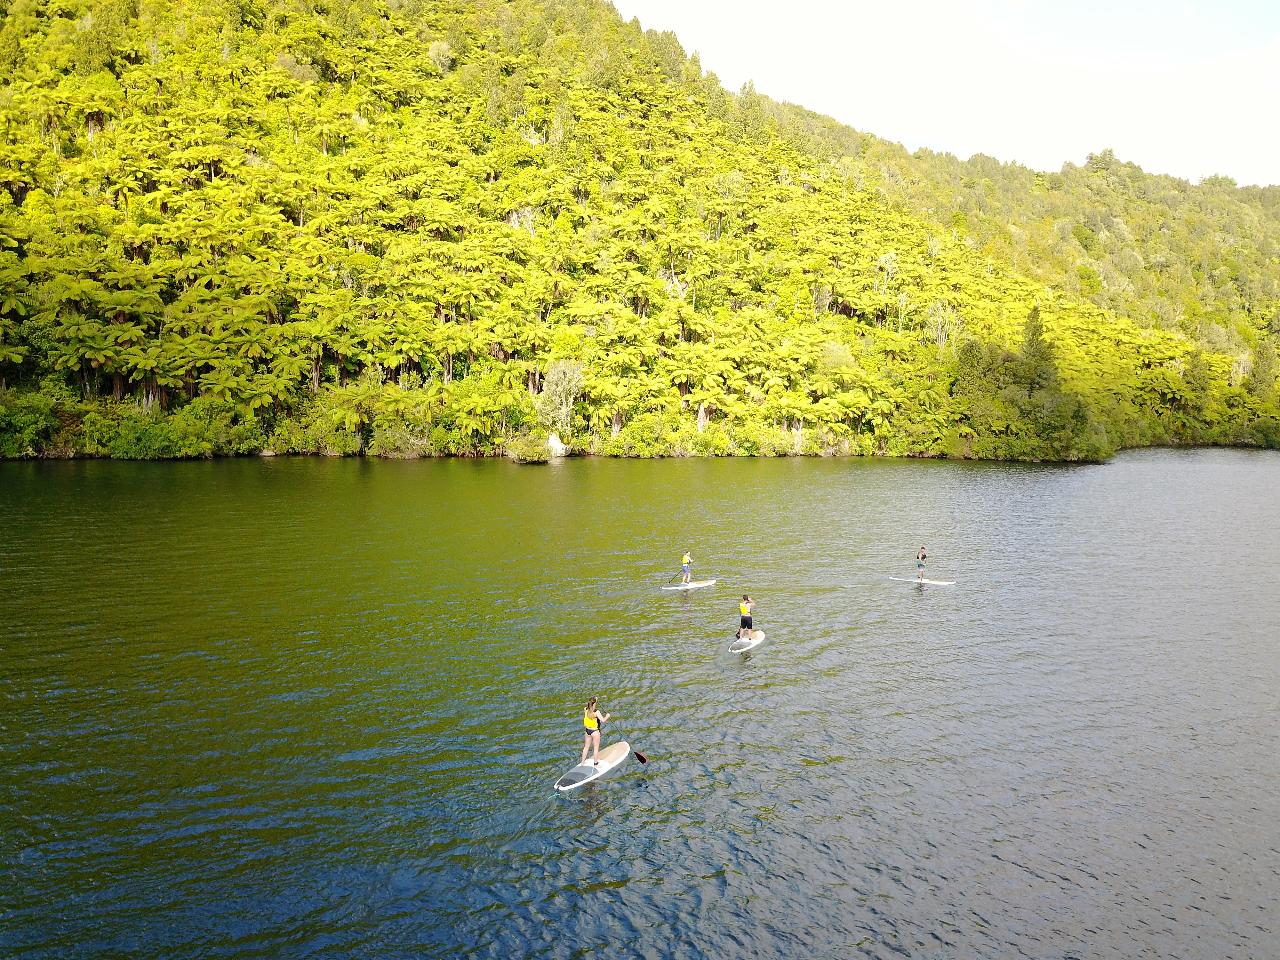 Jetboard Wilderness Tour